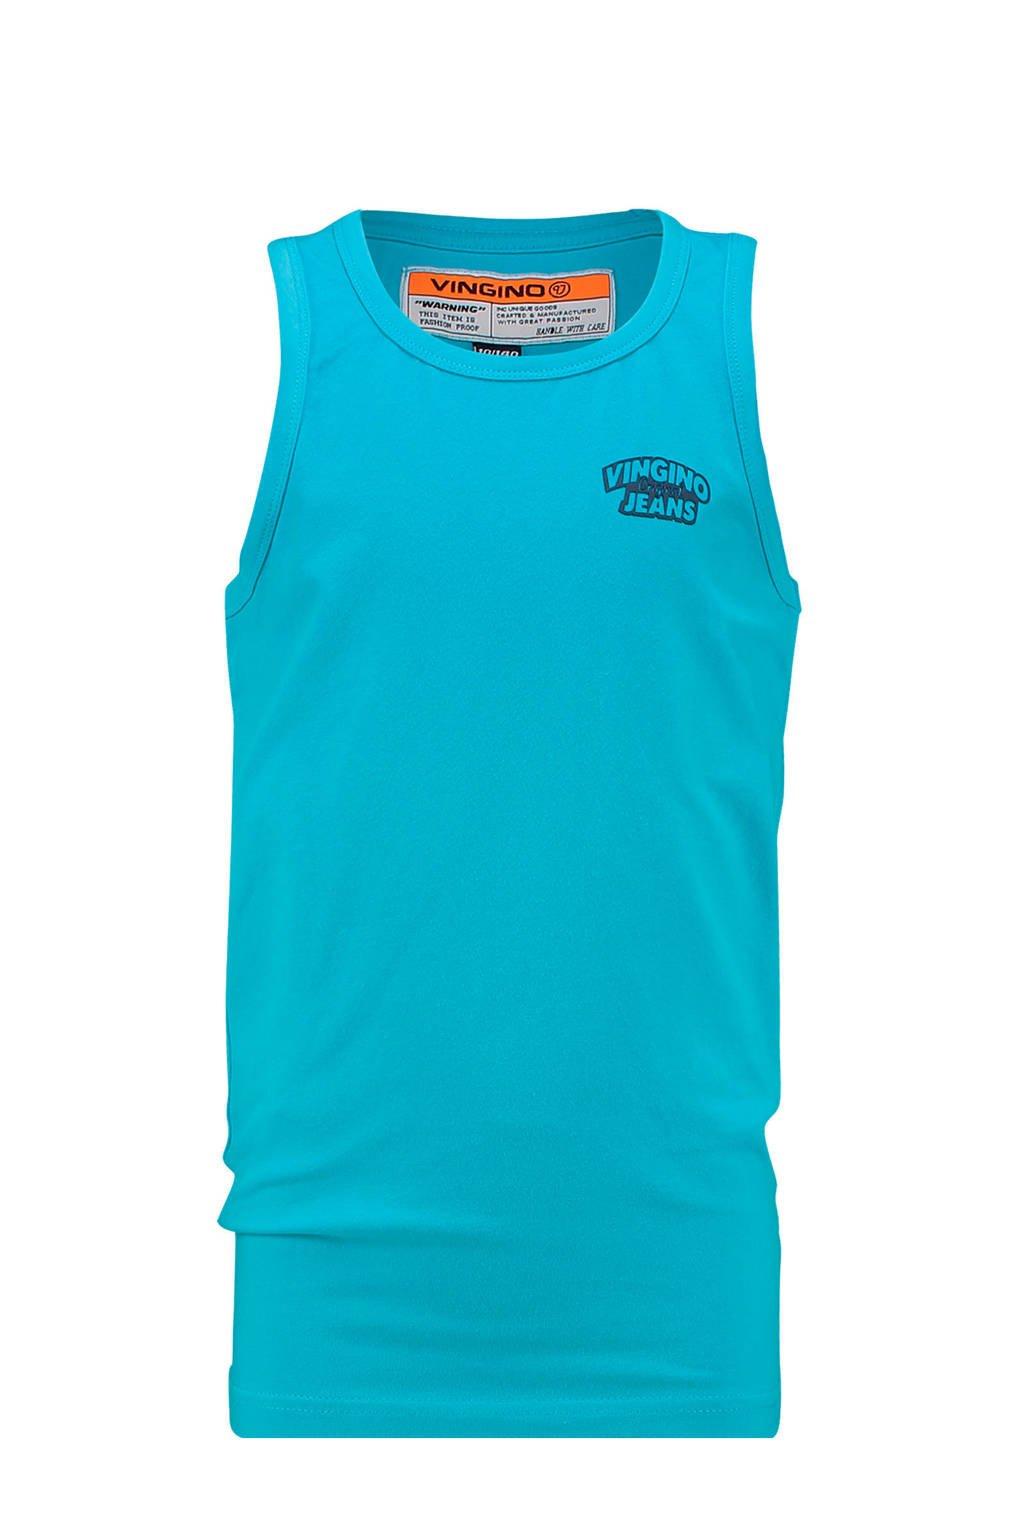 Vingino mouwloos T-shirt Gavi met logo aqua blauw, Aqua blauw